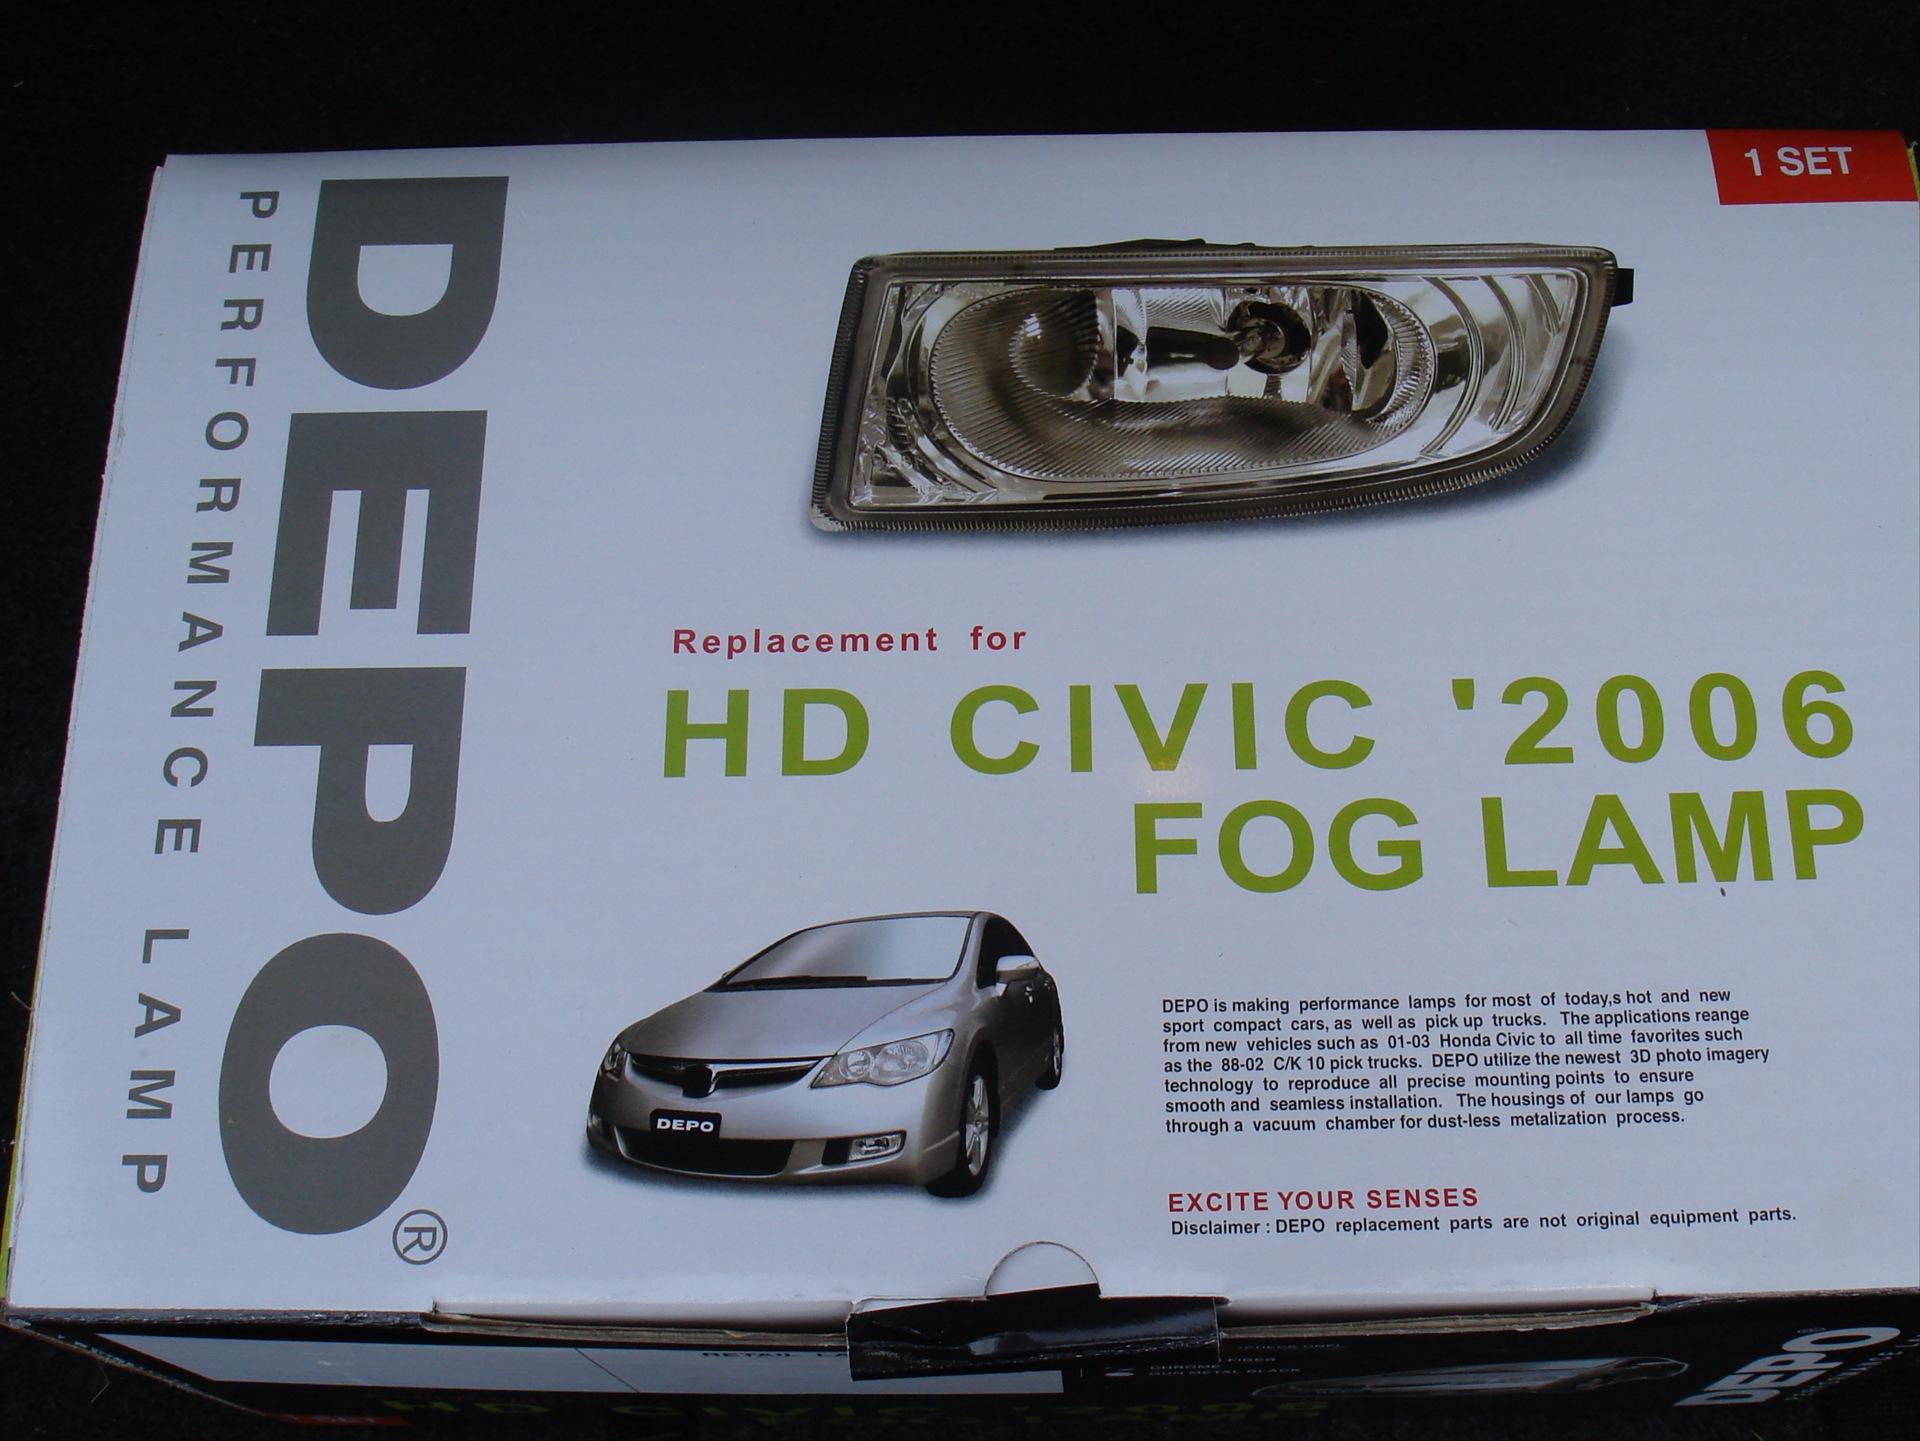 Honda civic 4d 2008 установка доп оборудования